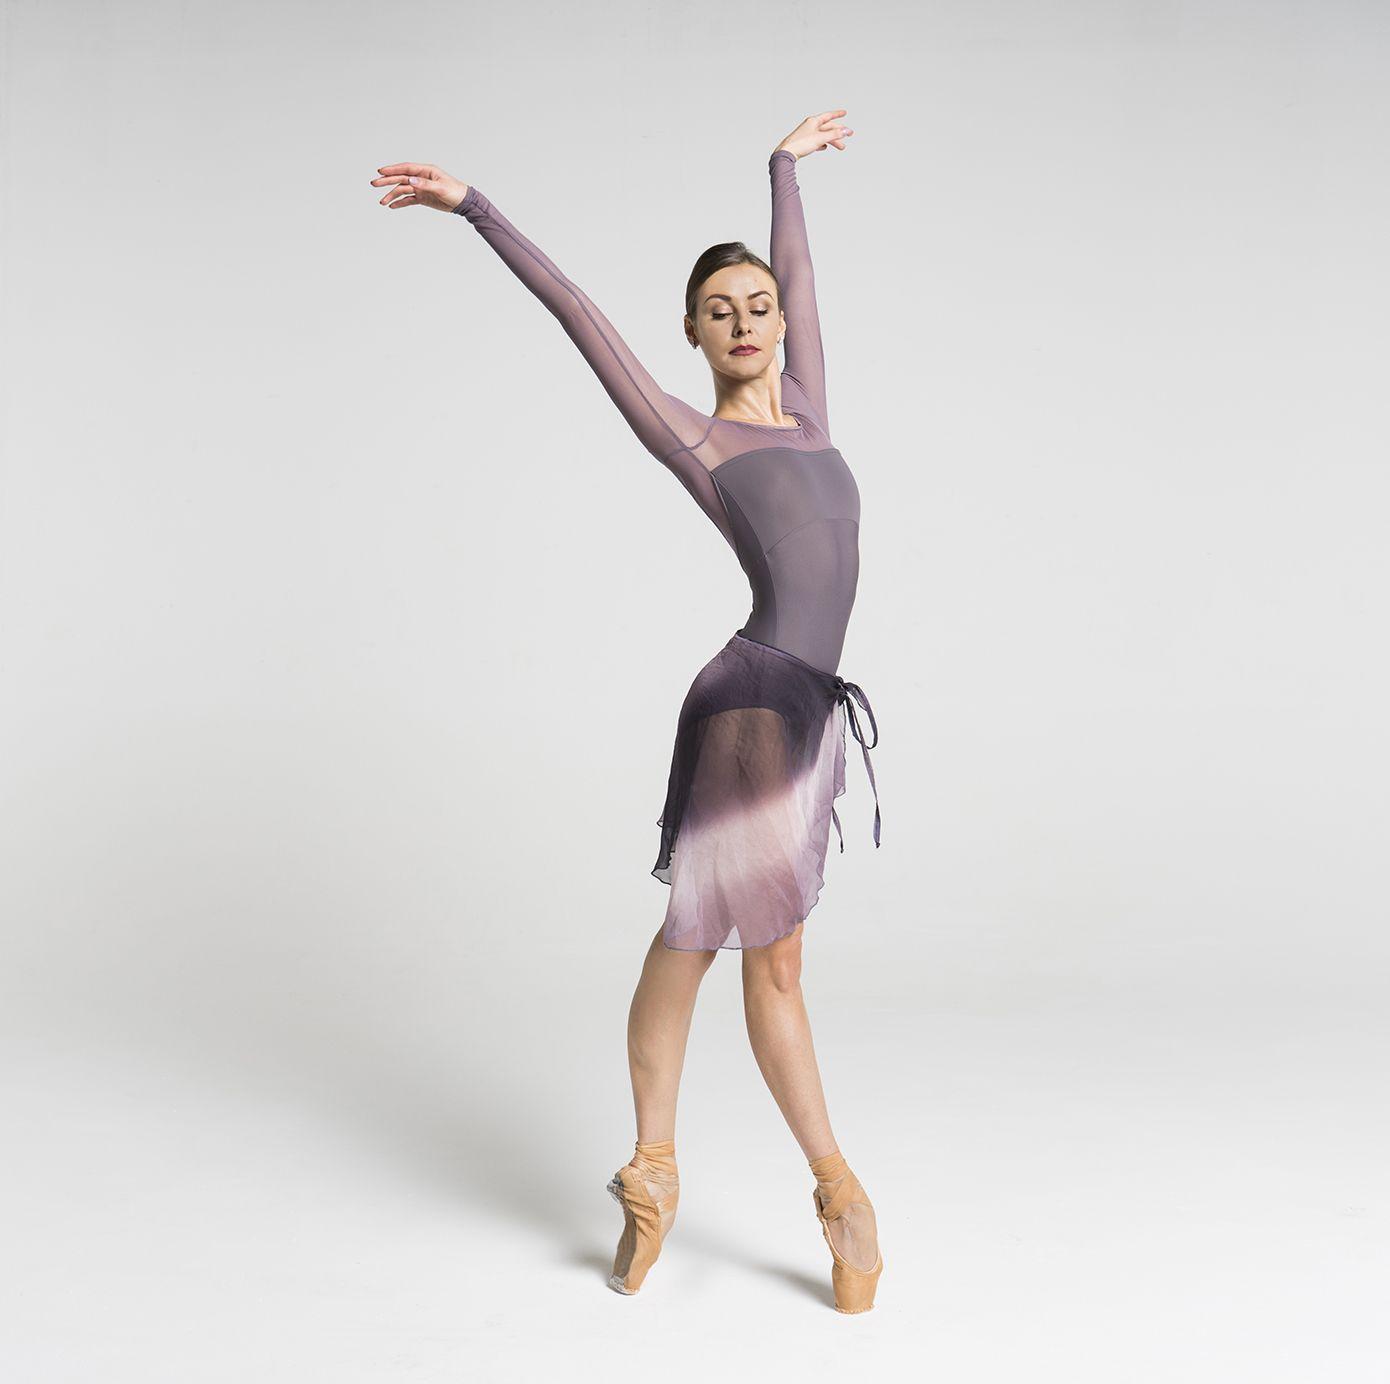 Our dream leotard by the stunning Kristina Kretova !!!💎💎💎 Photo by Alisa Aslanova #balletmaniacs #balletwear #dreamleotards #balletstars #bolshoiballet #russianballerina #balletdancers #fashion #dancewear